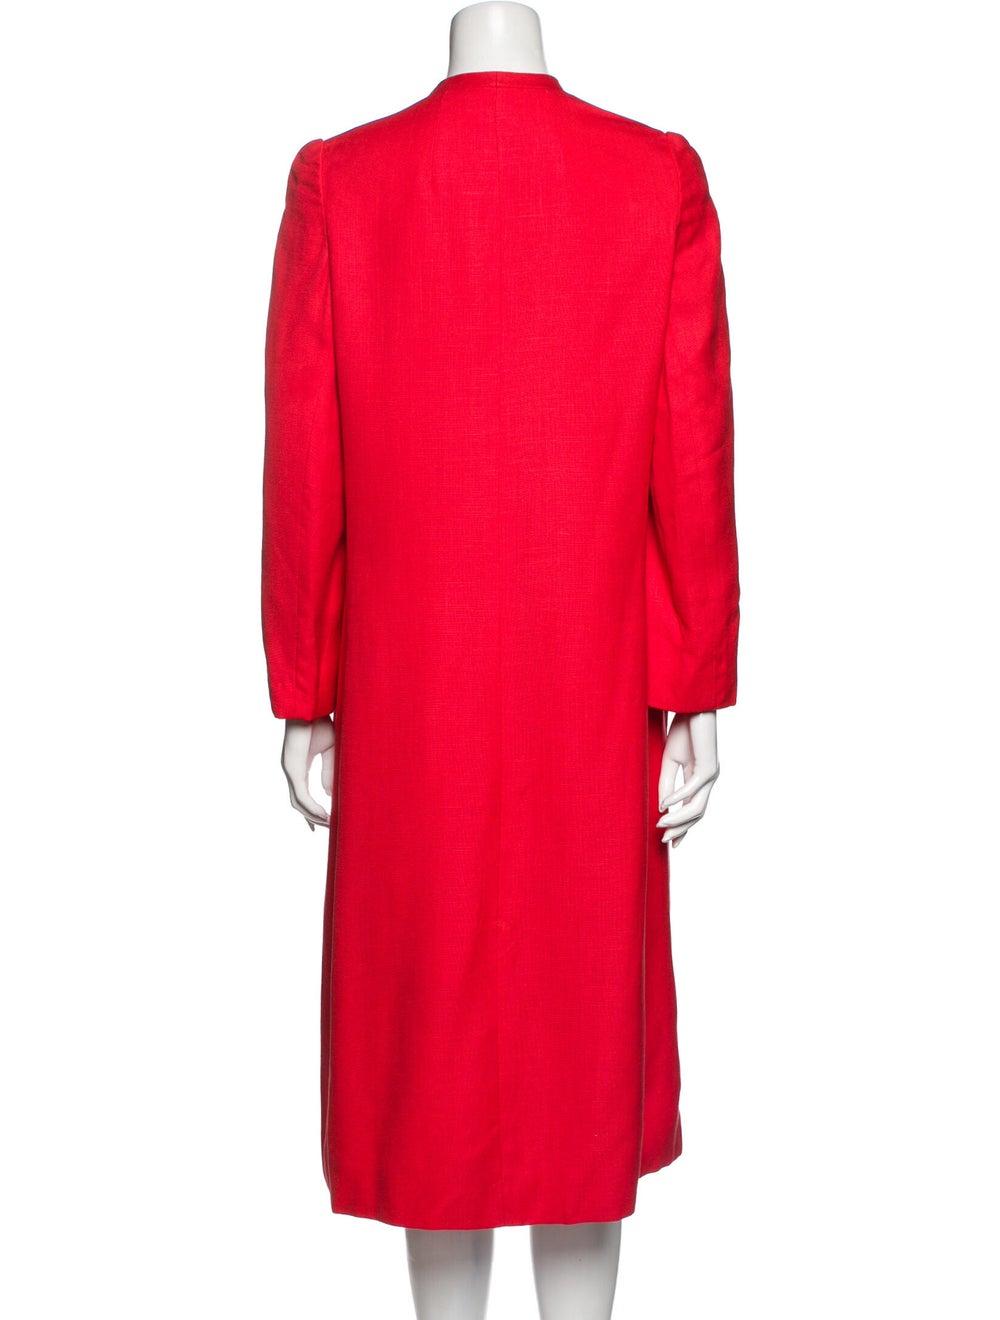 Halston Vintage Midi Length Dress Red - image 3